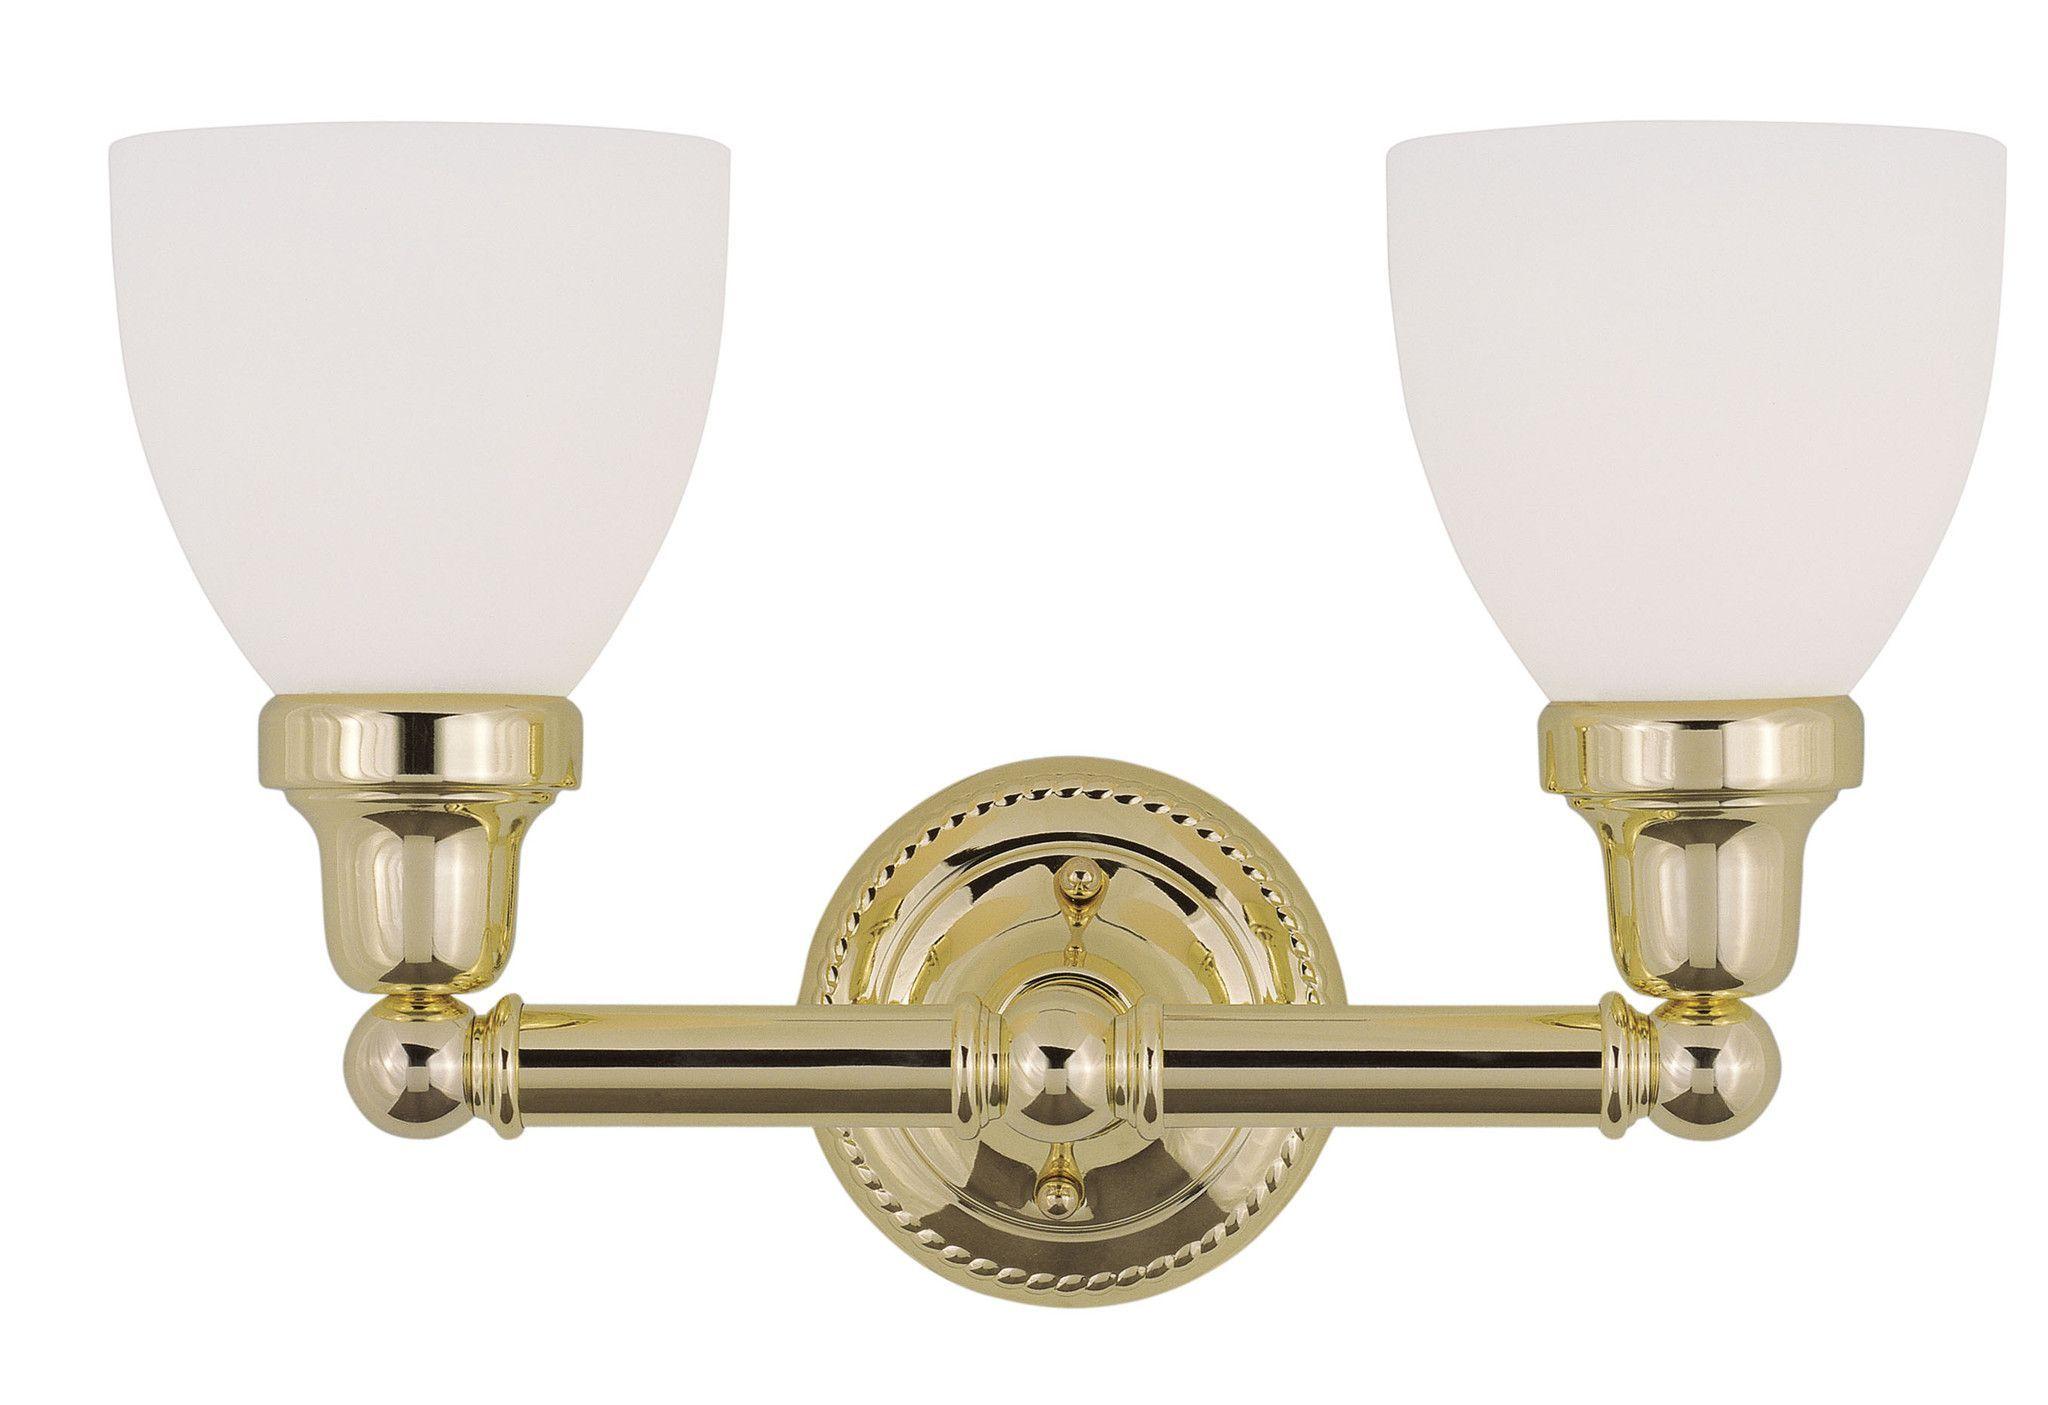 Livex Lighting Classic Polished Brass Bath Light 1022-02 | Bath ...